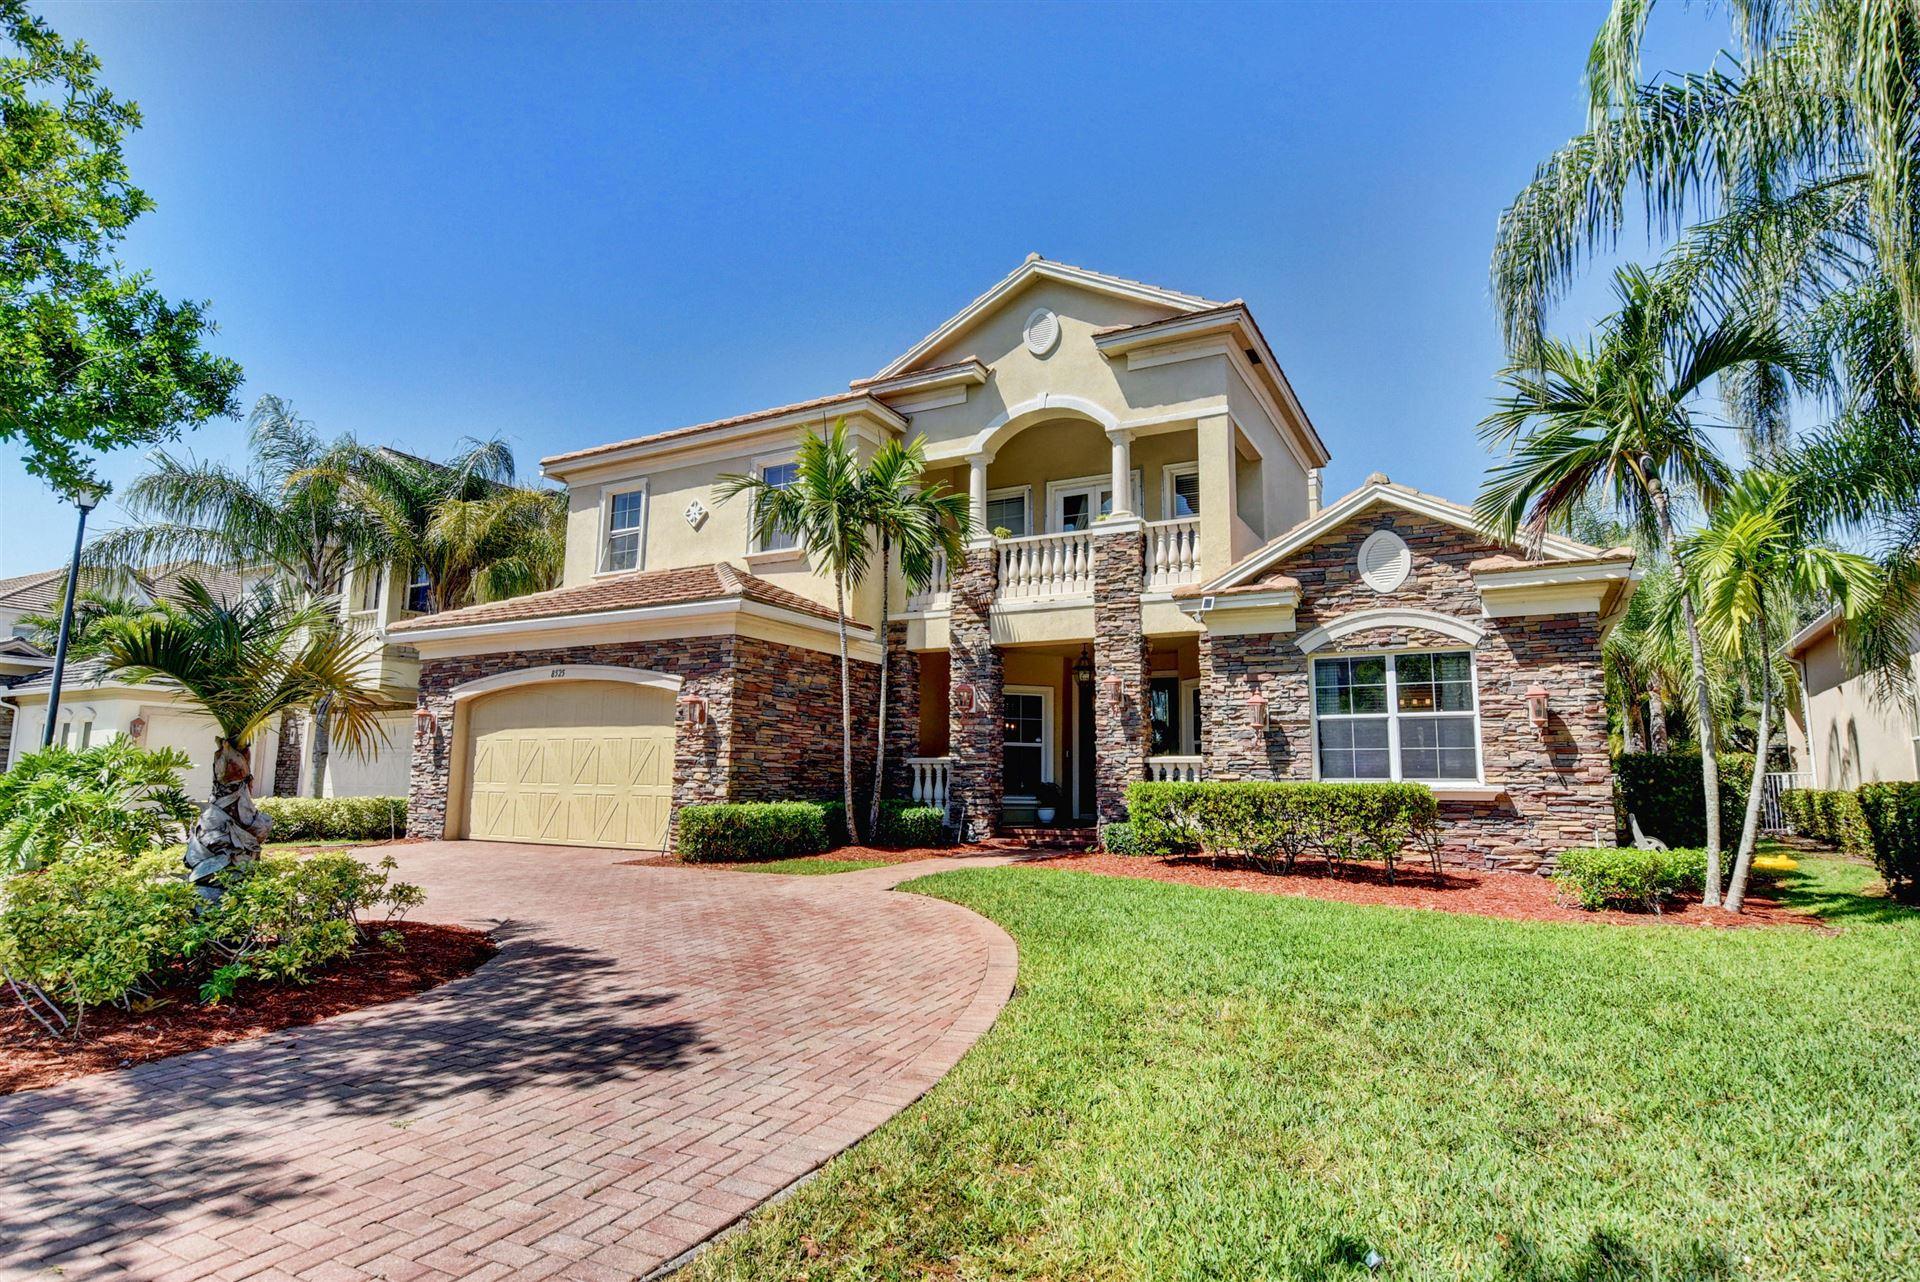 8525 Butler Greenwood Drive, Royal Palm Beach, FL 33411 - #: RX-10707889